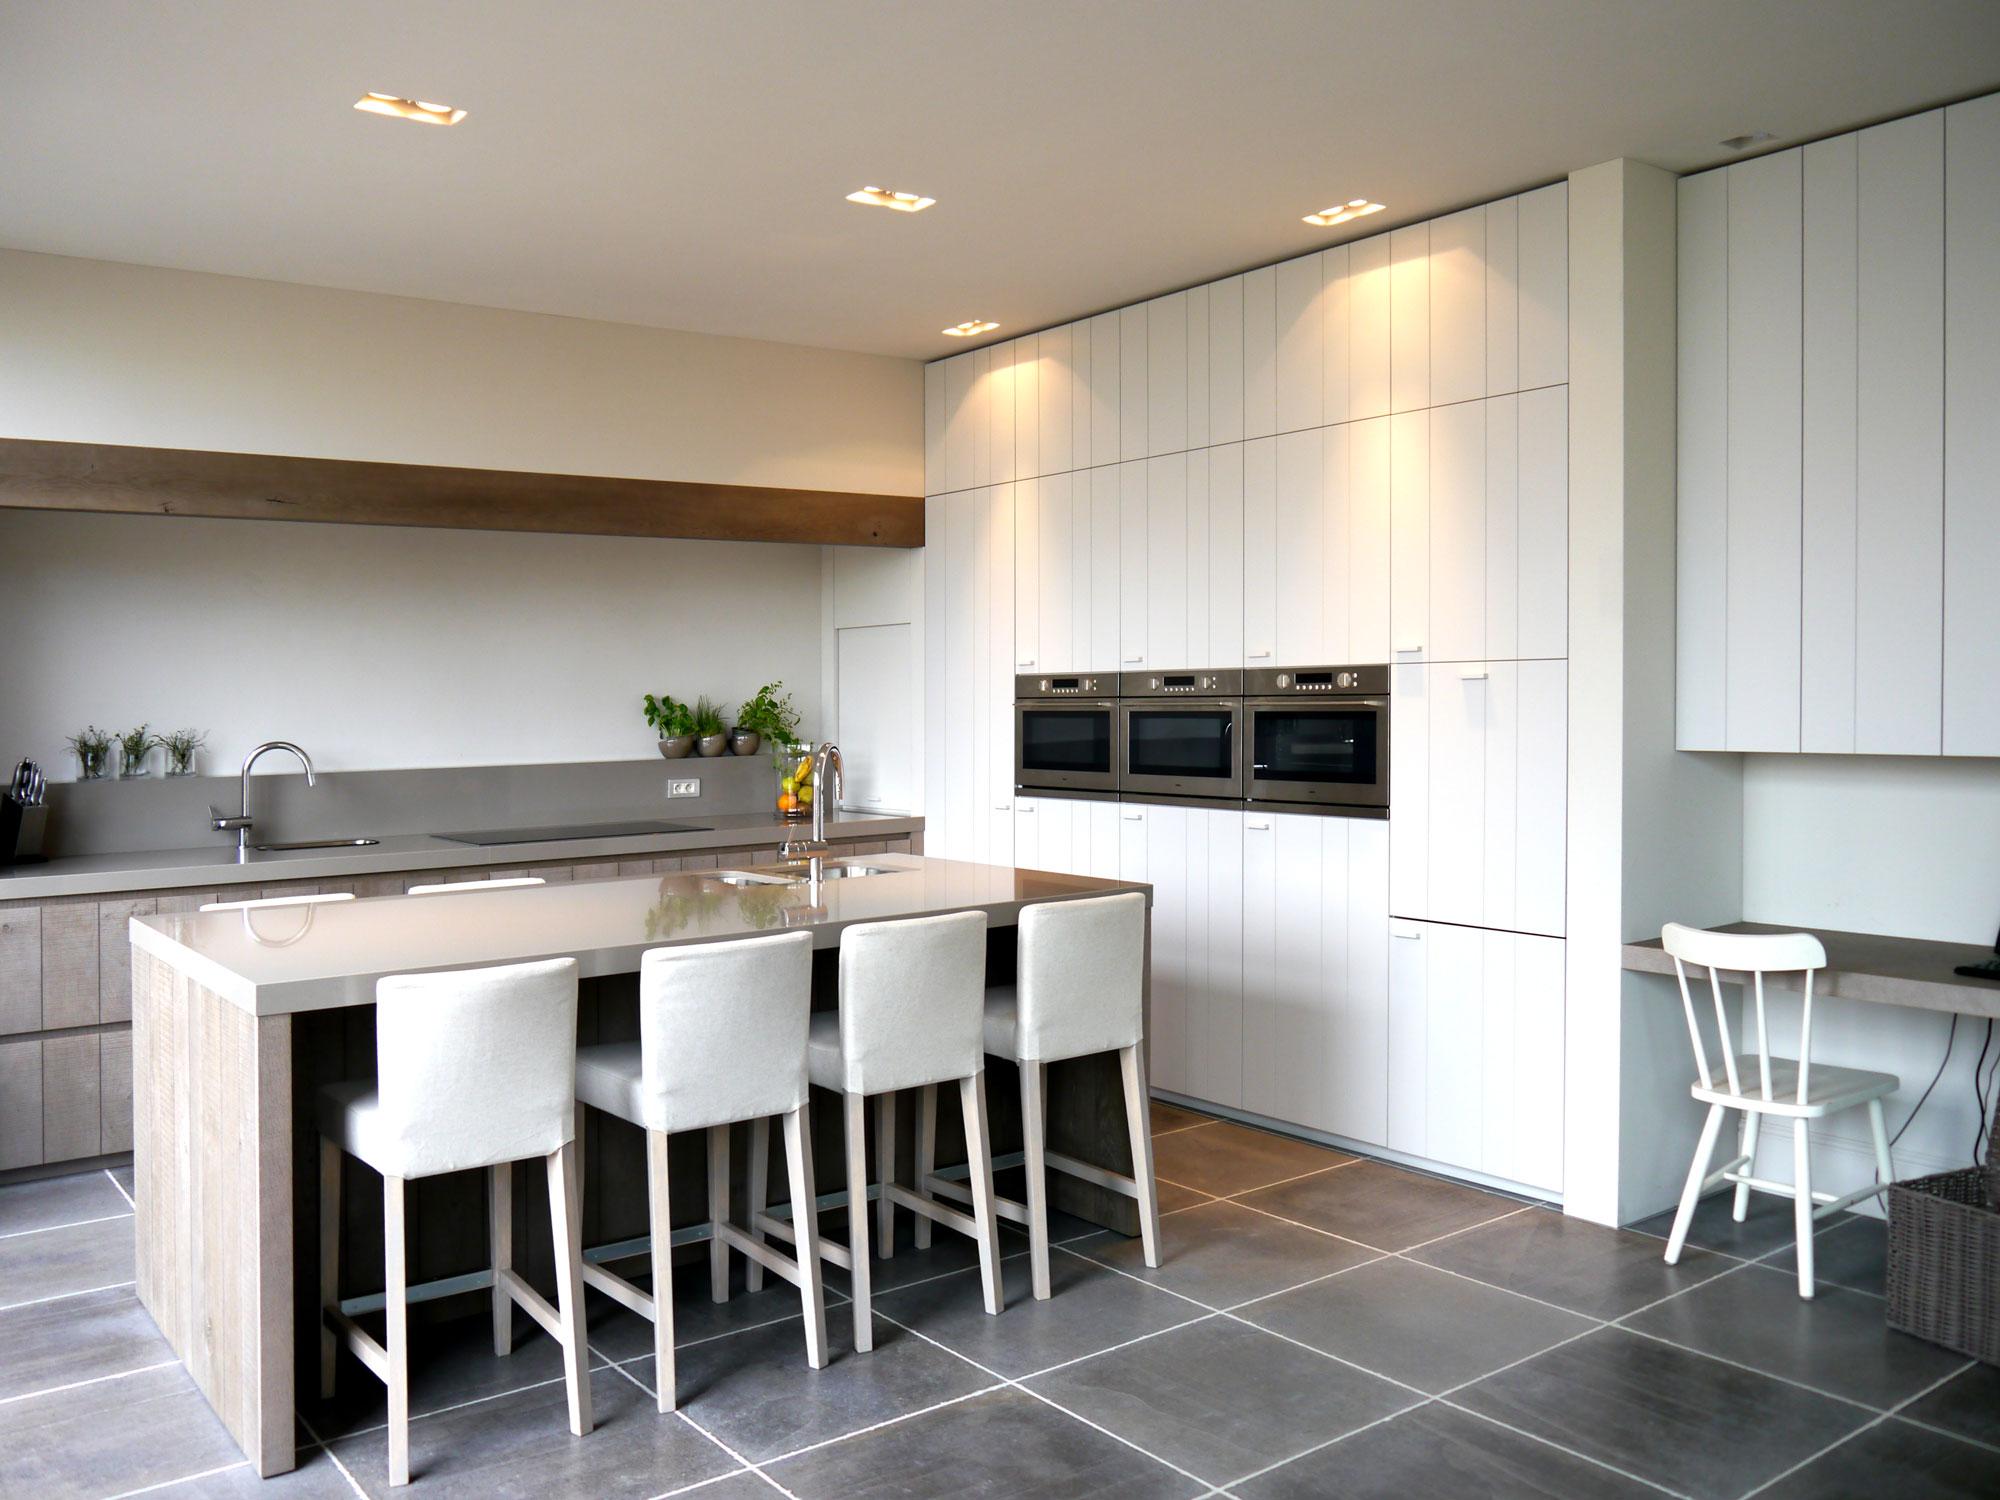 Interieurarchitect Landelijk Modern : Projecten landelijk interieurarchitect charlotte van bruwaene